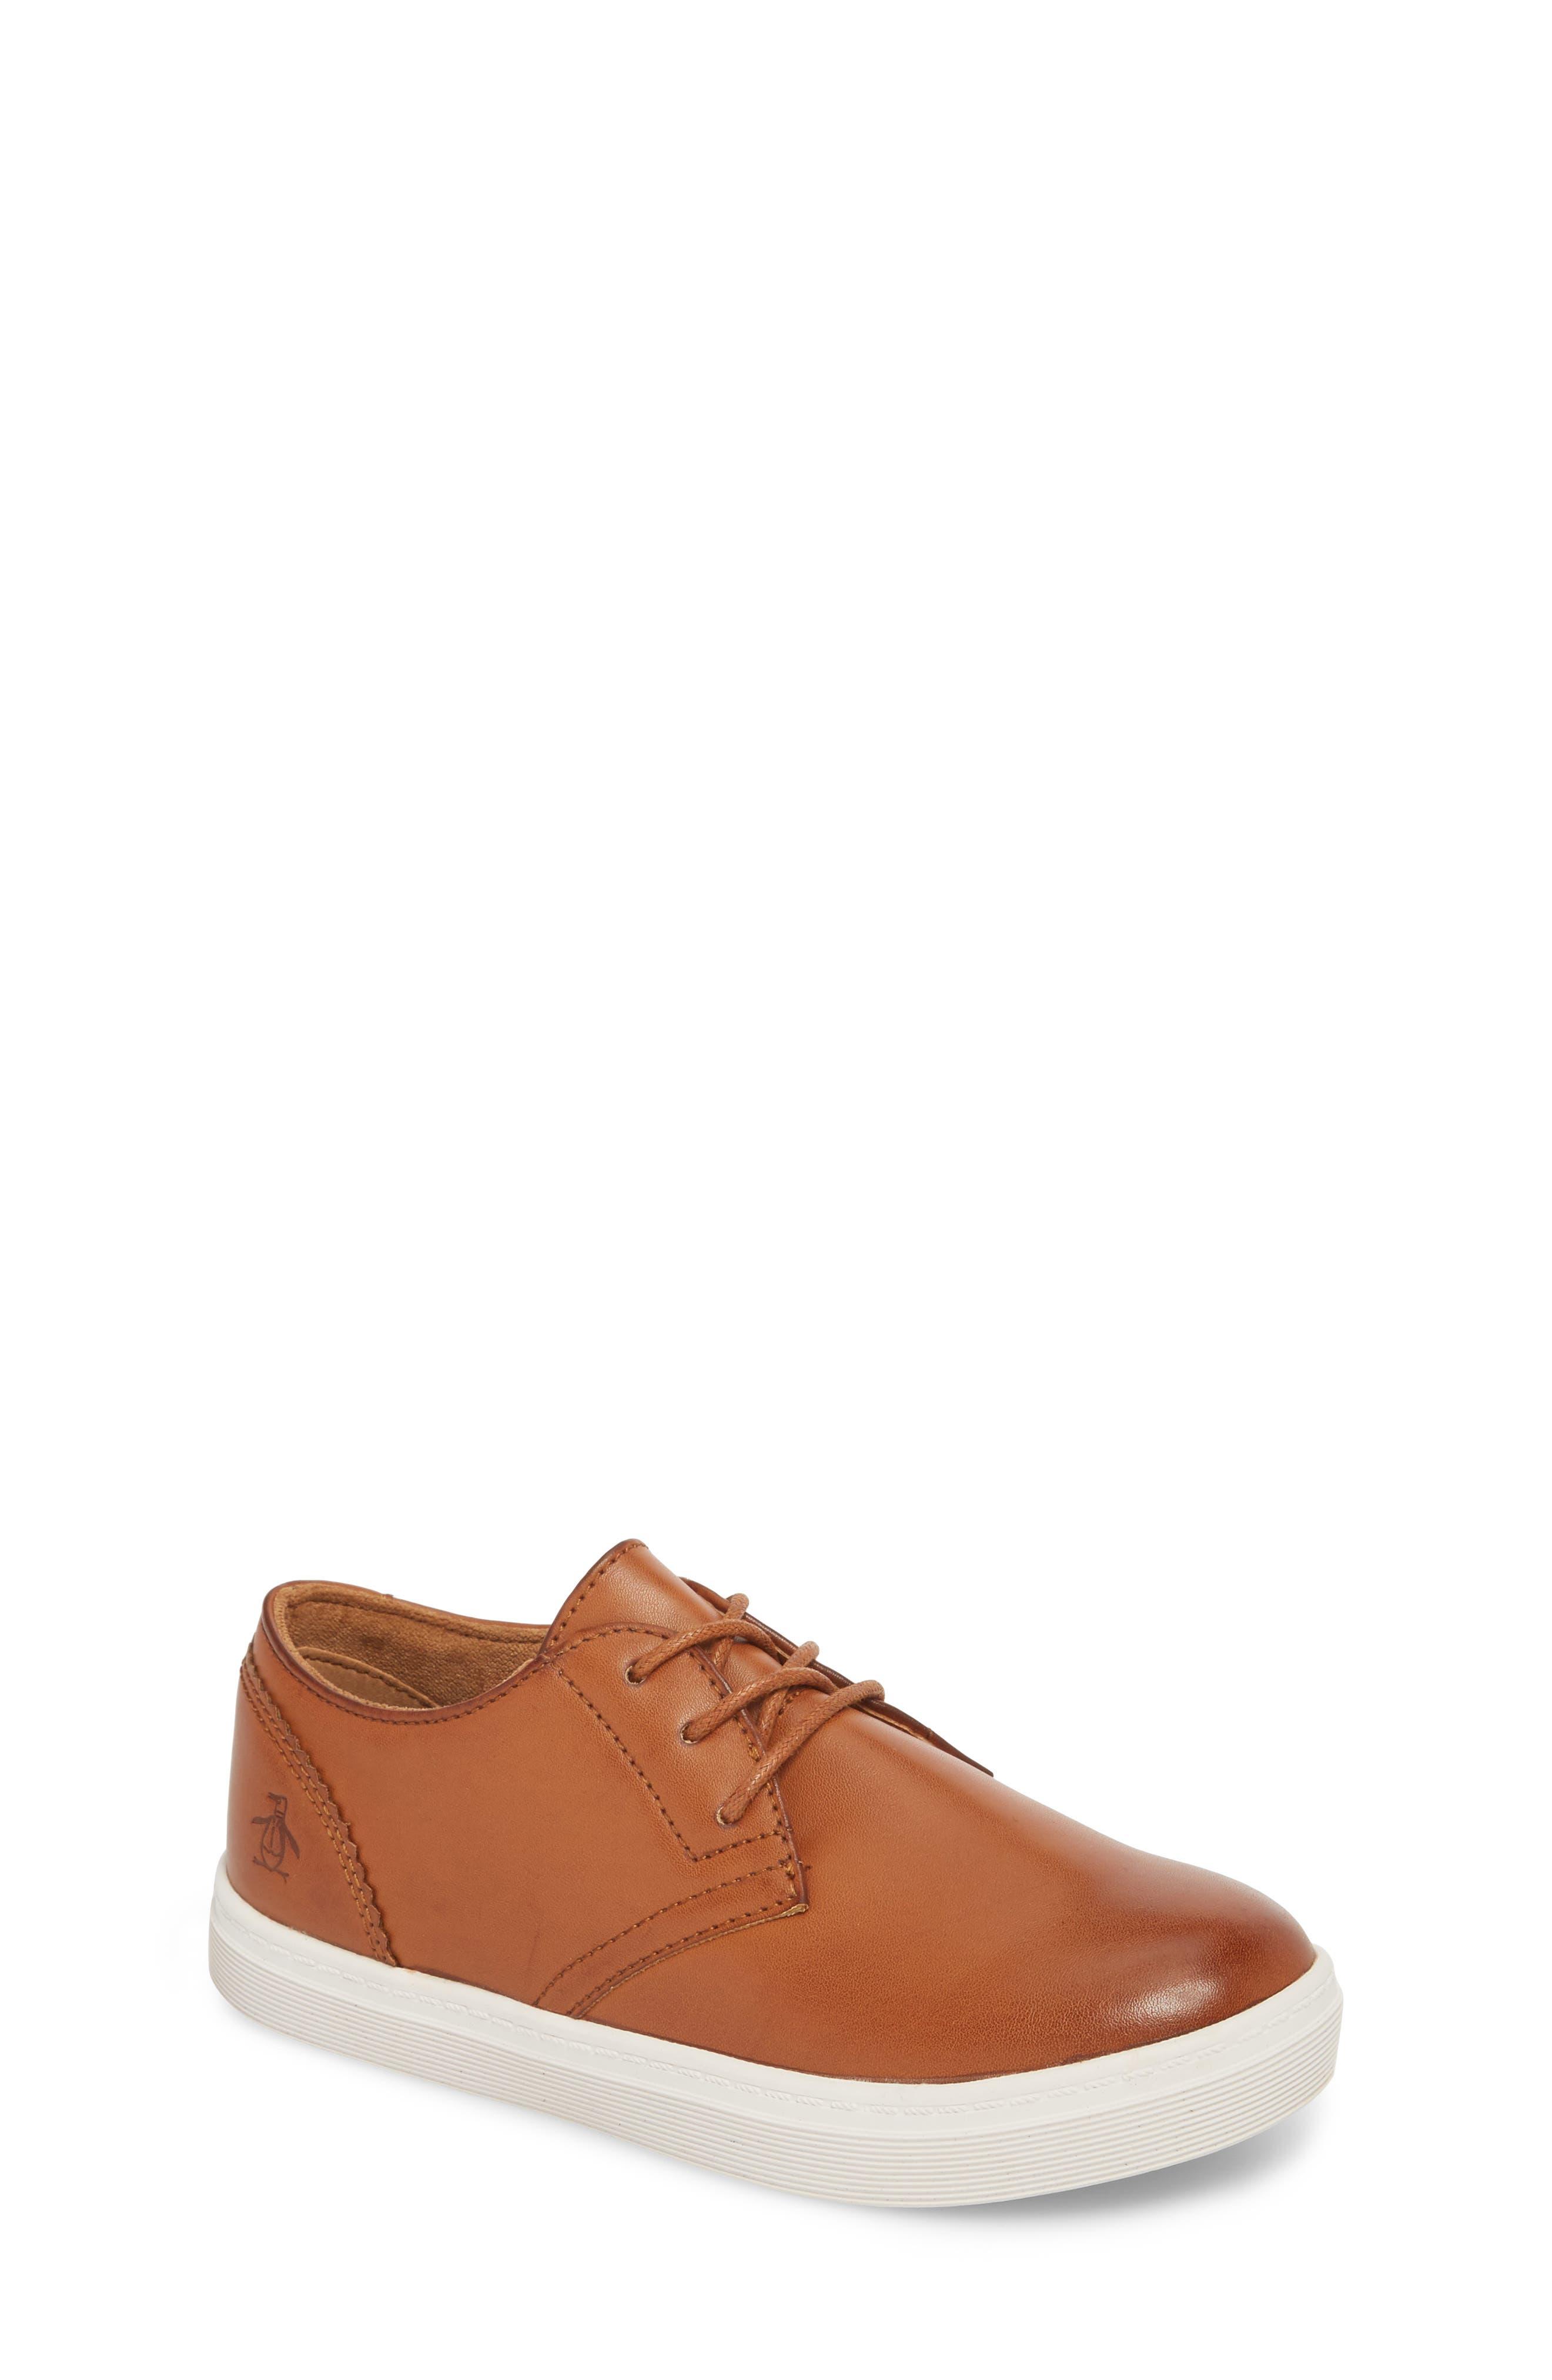 ORIGINAL PENGUIN, Freeland Sneaker, Main thumbnail 1, color, COGNAC